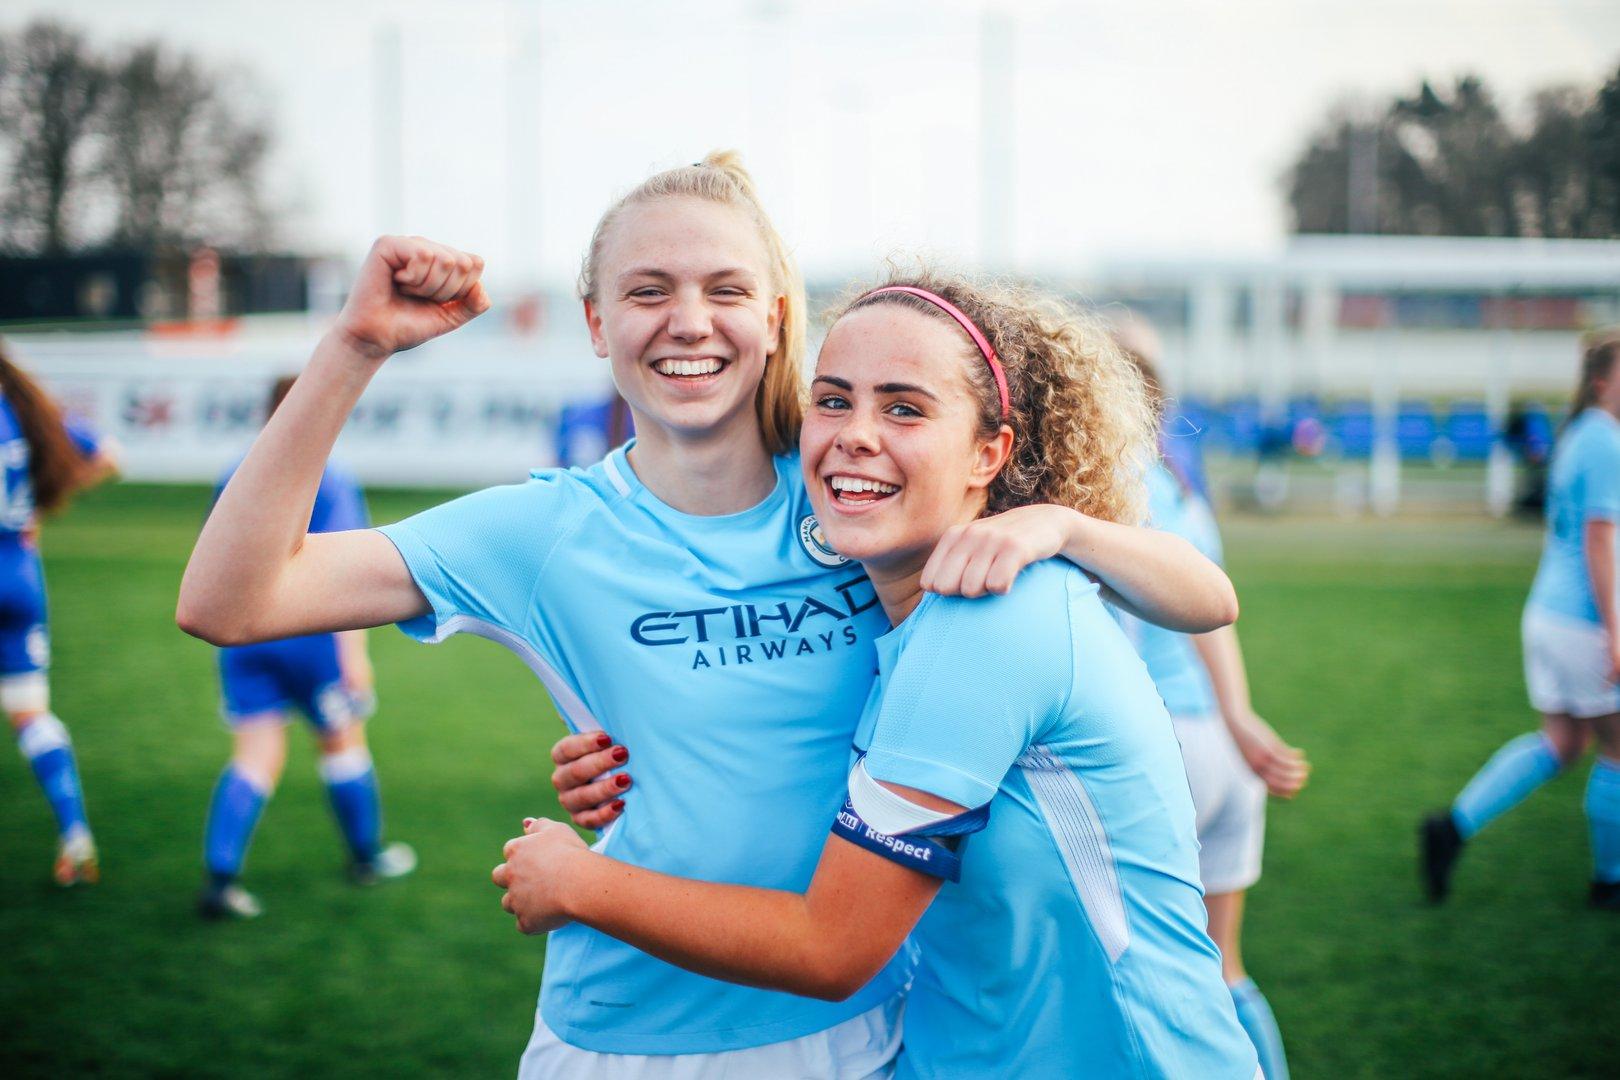 Manchester City Girls' Academy Regional Talent Club trials